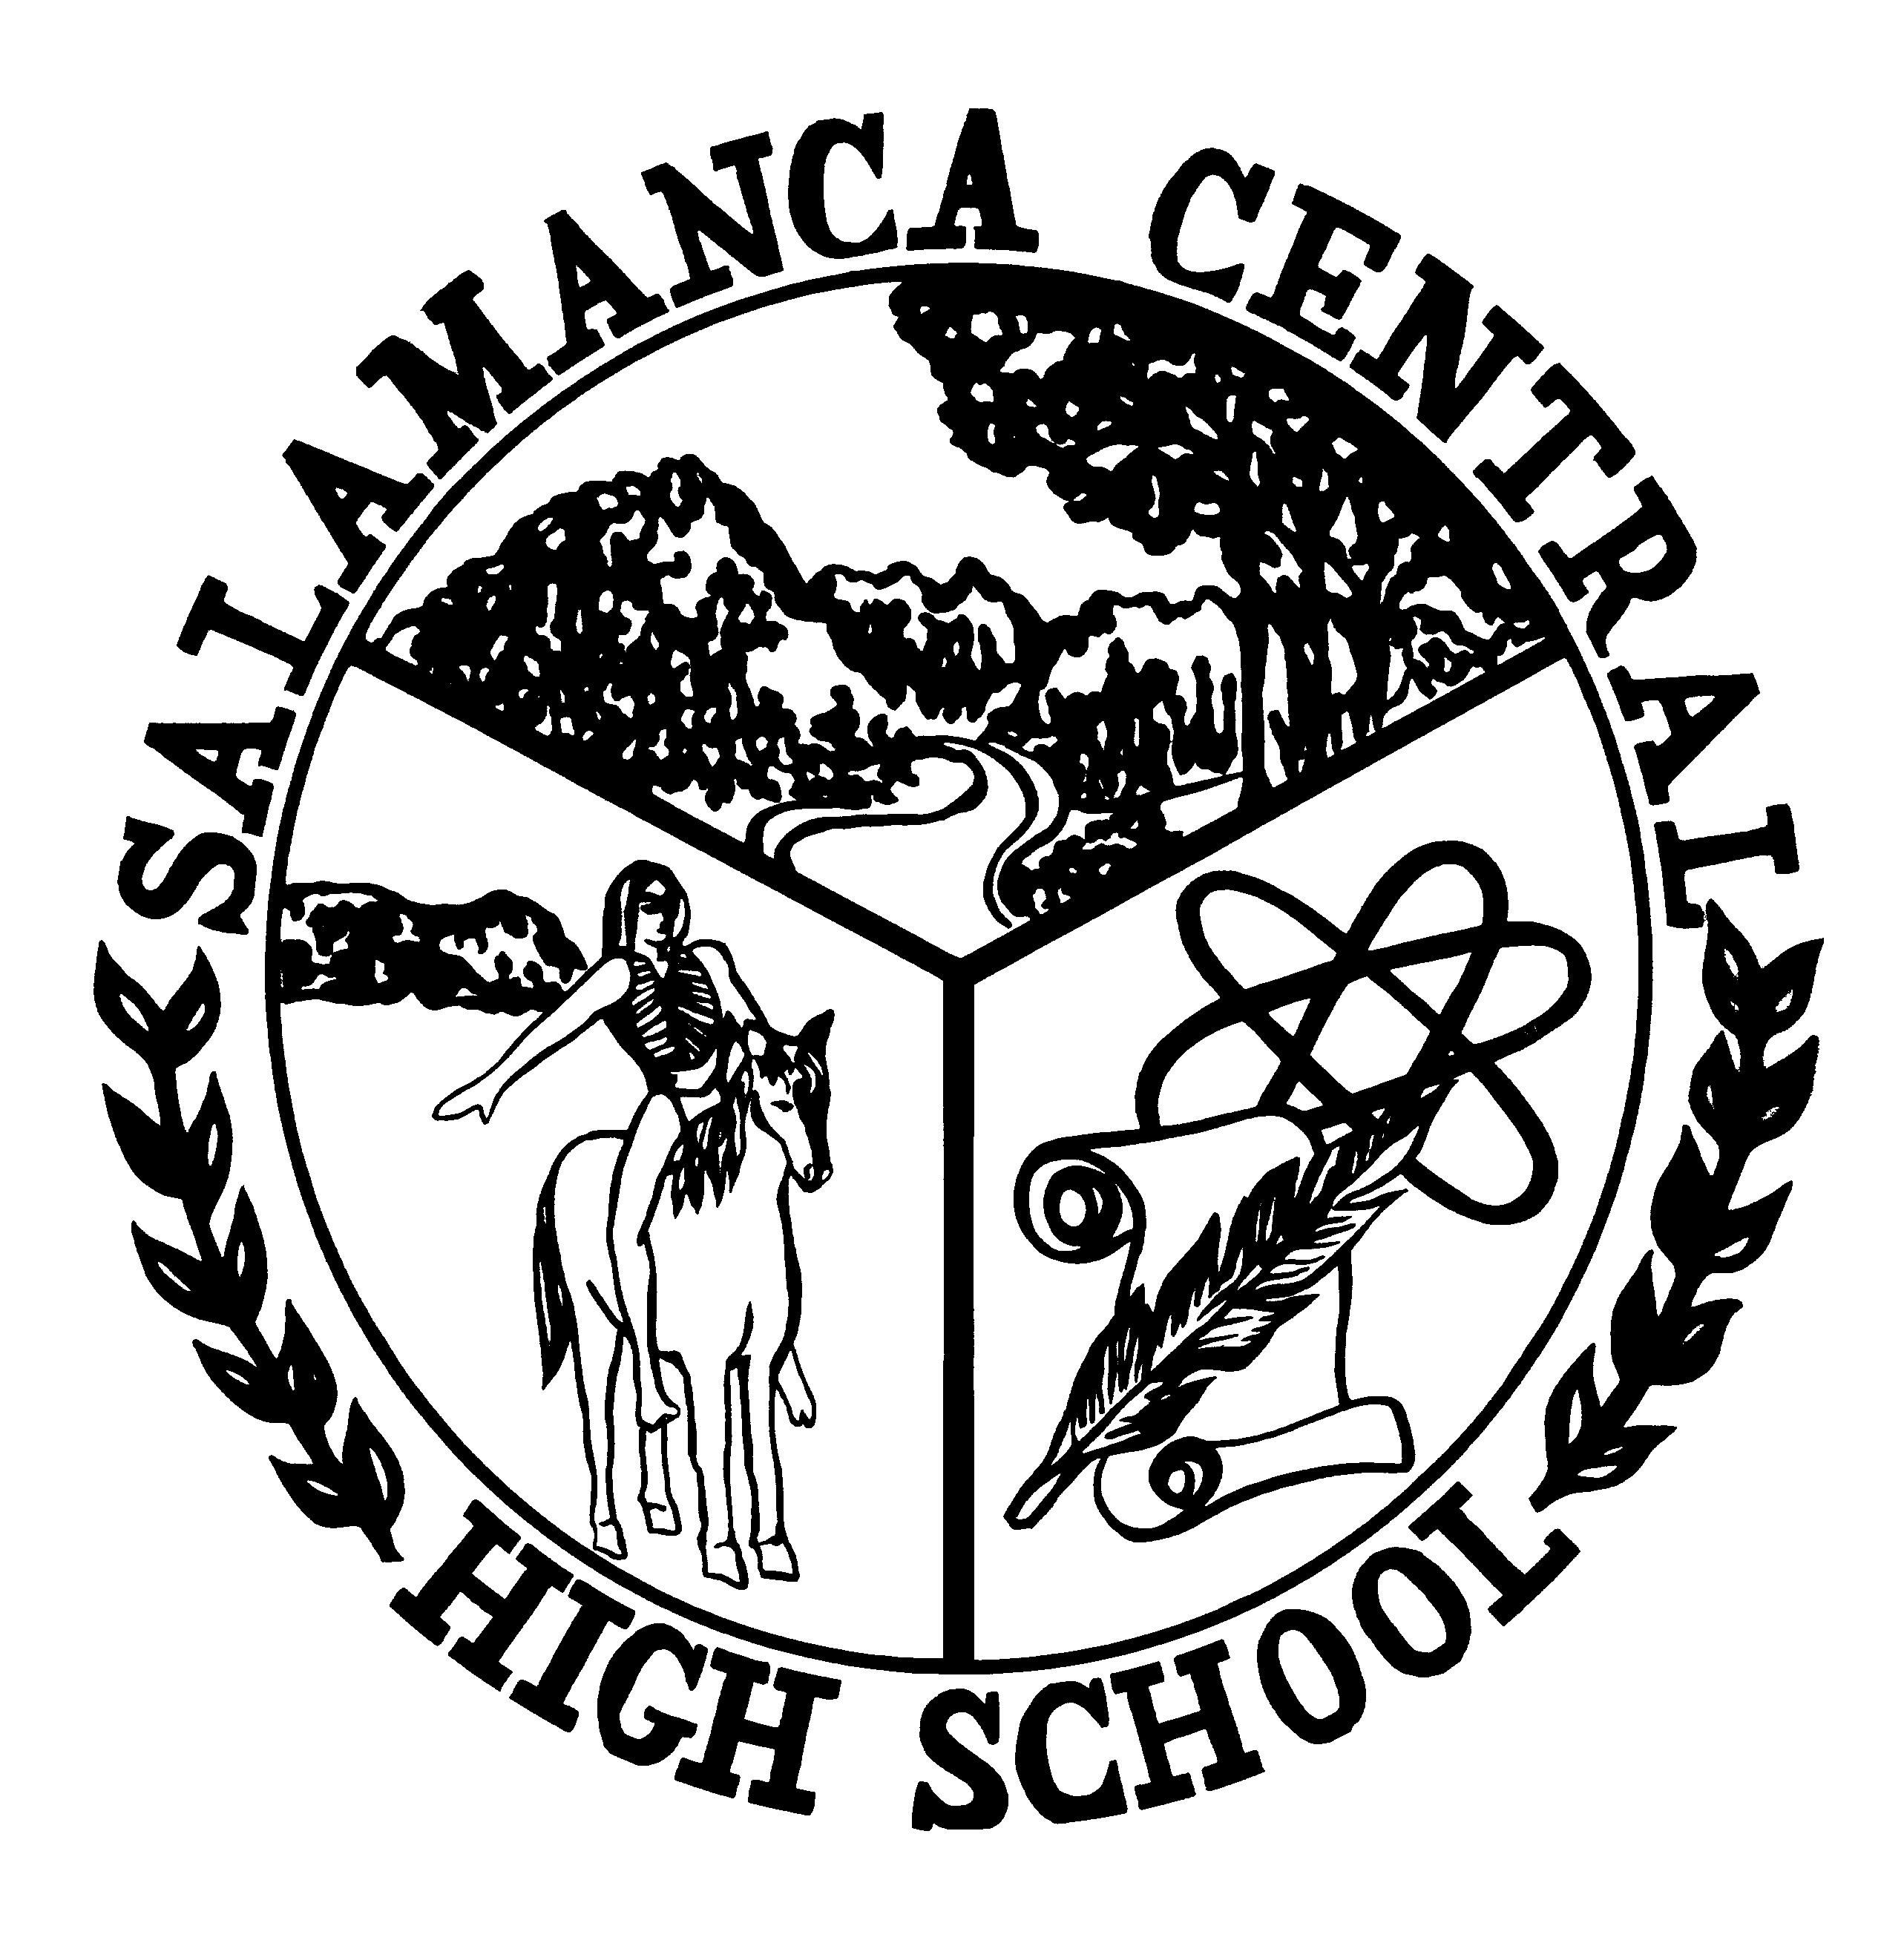 Salamanca High School Crest